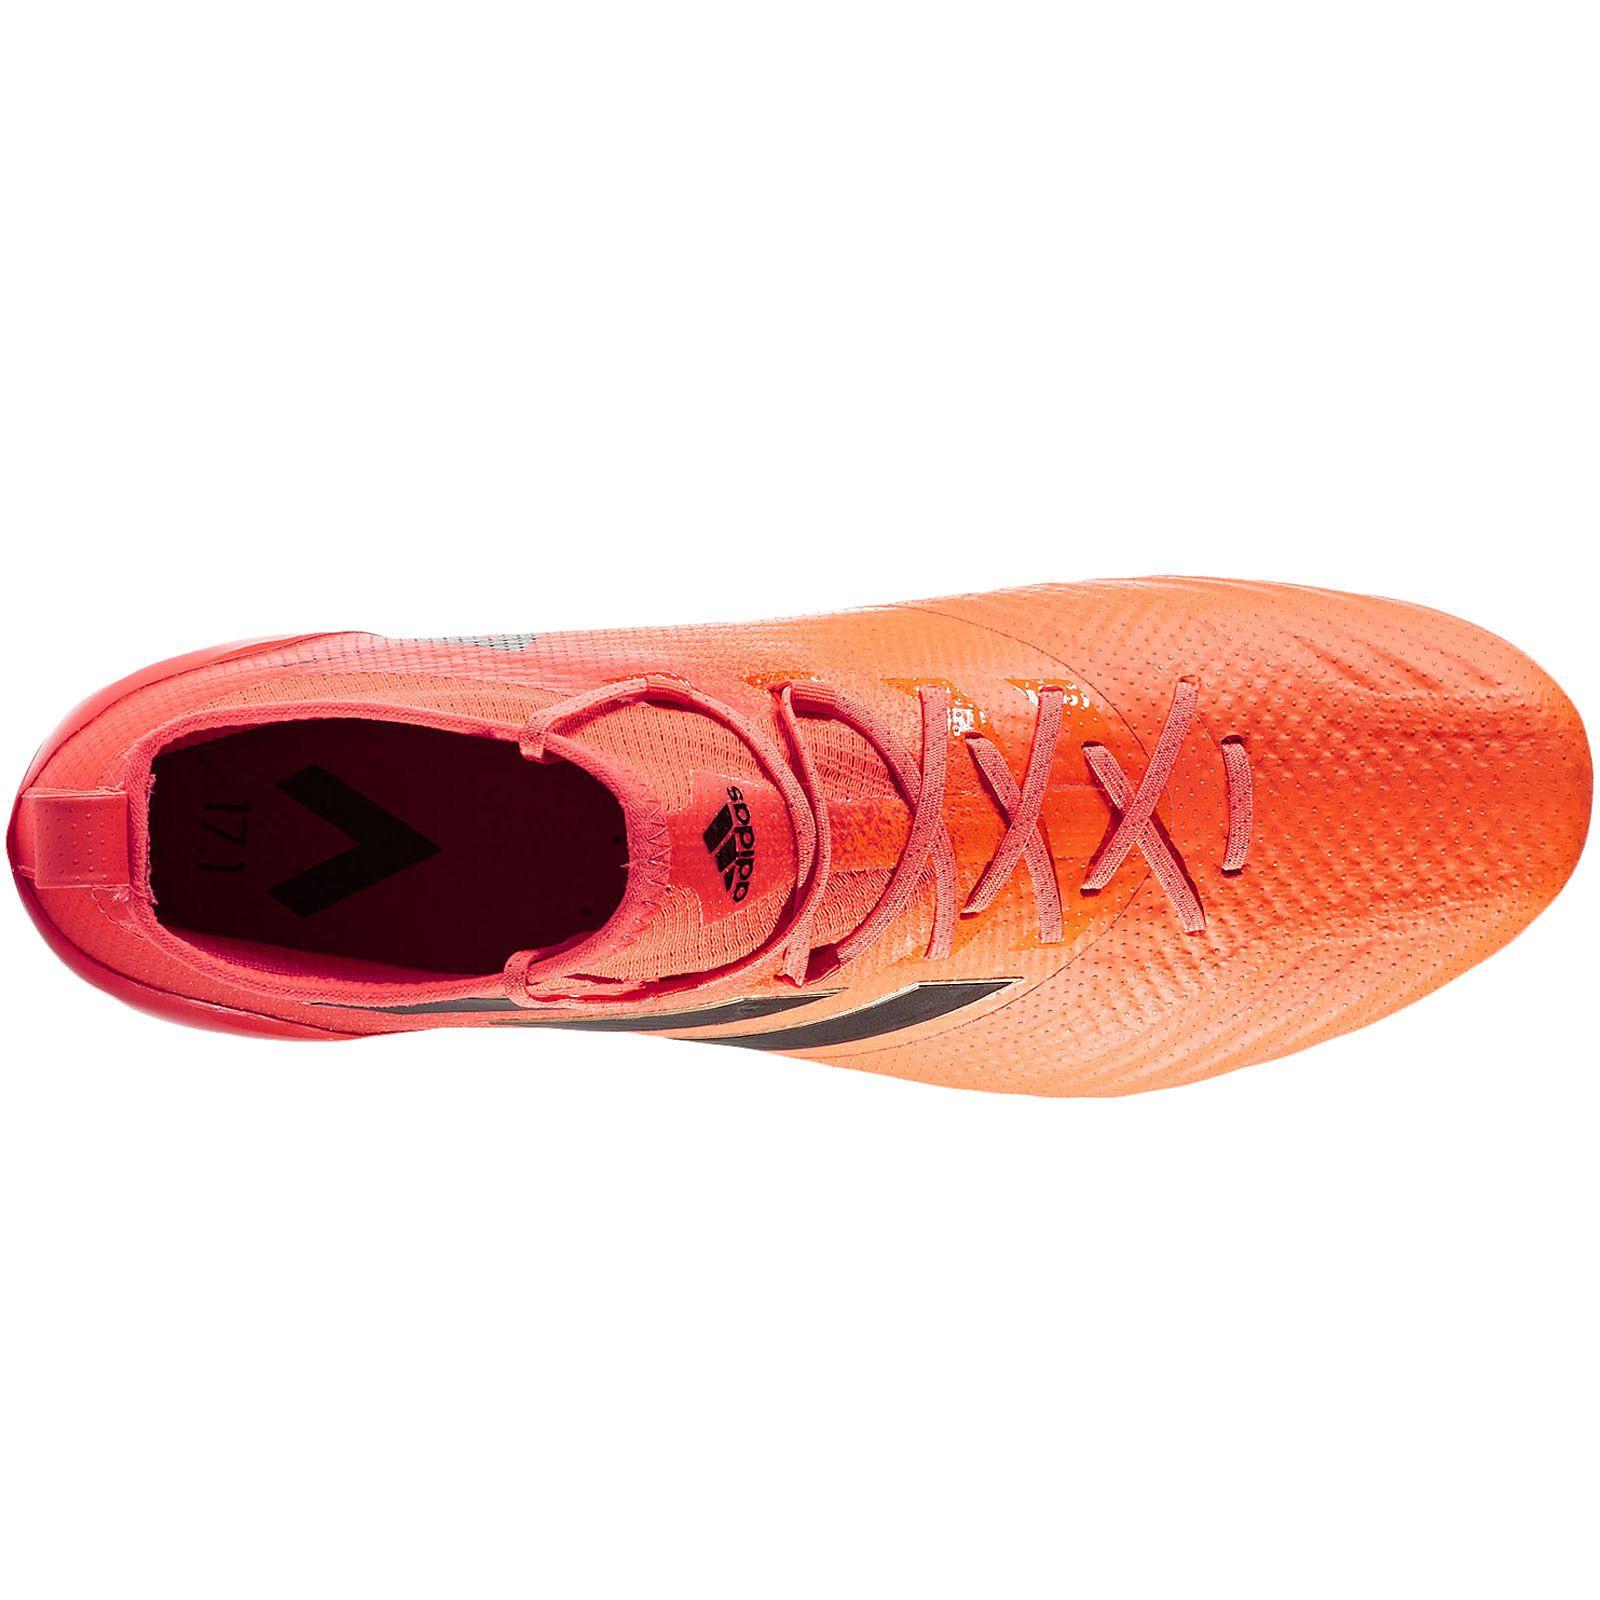 Chuteira Adidas Ace 17.1 SG Trava Mista